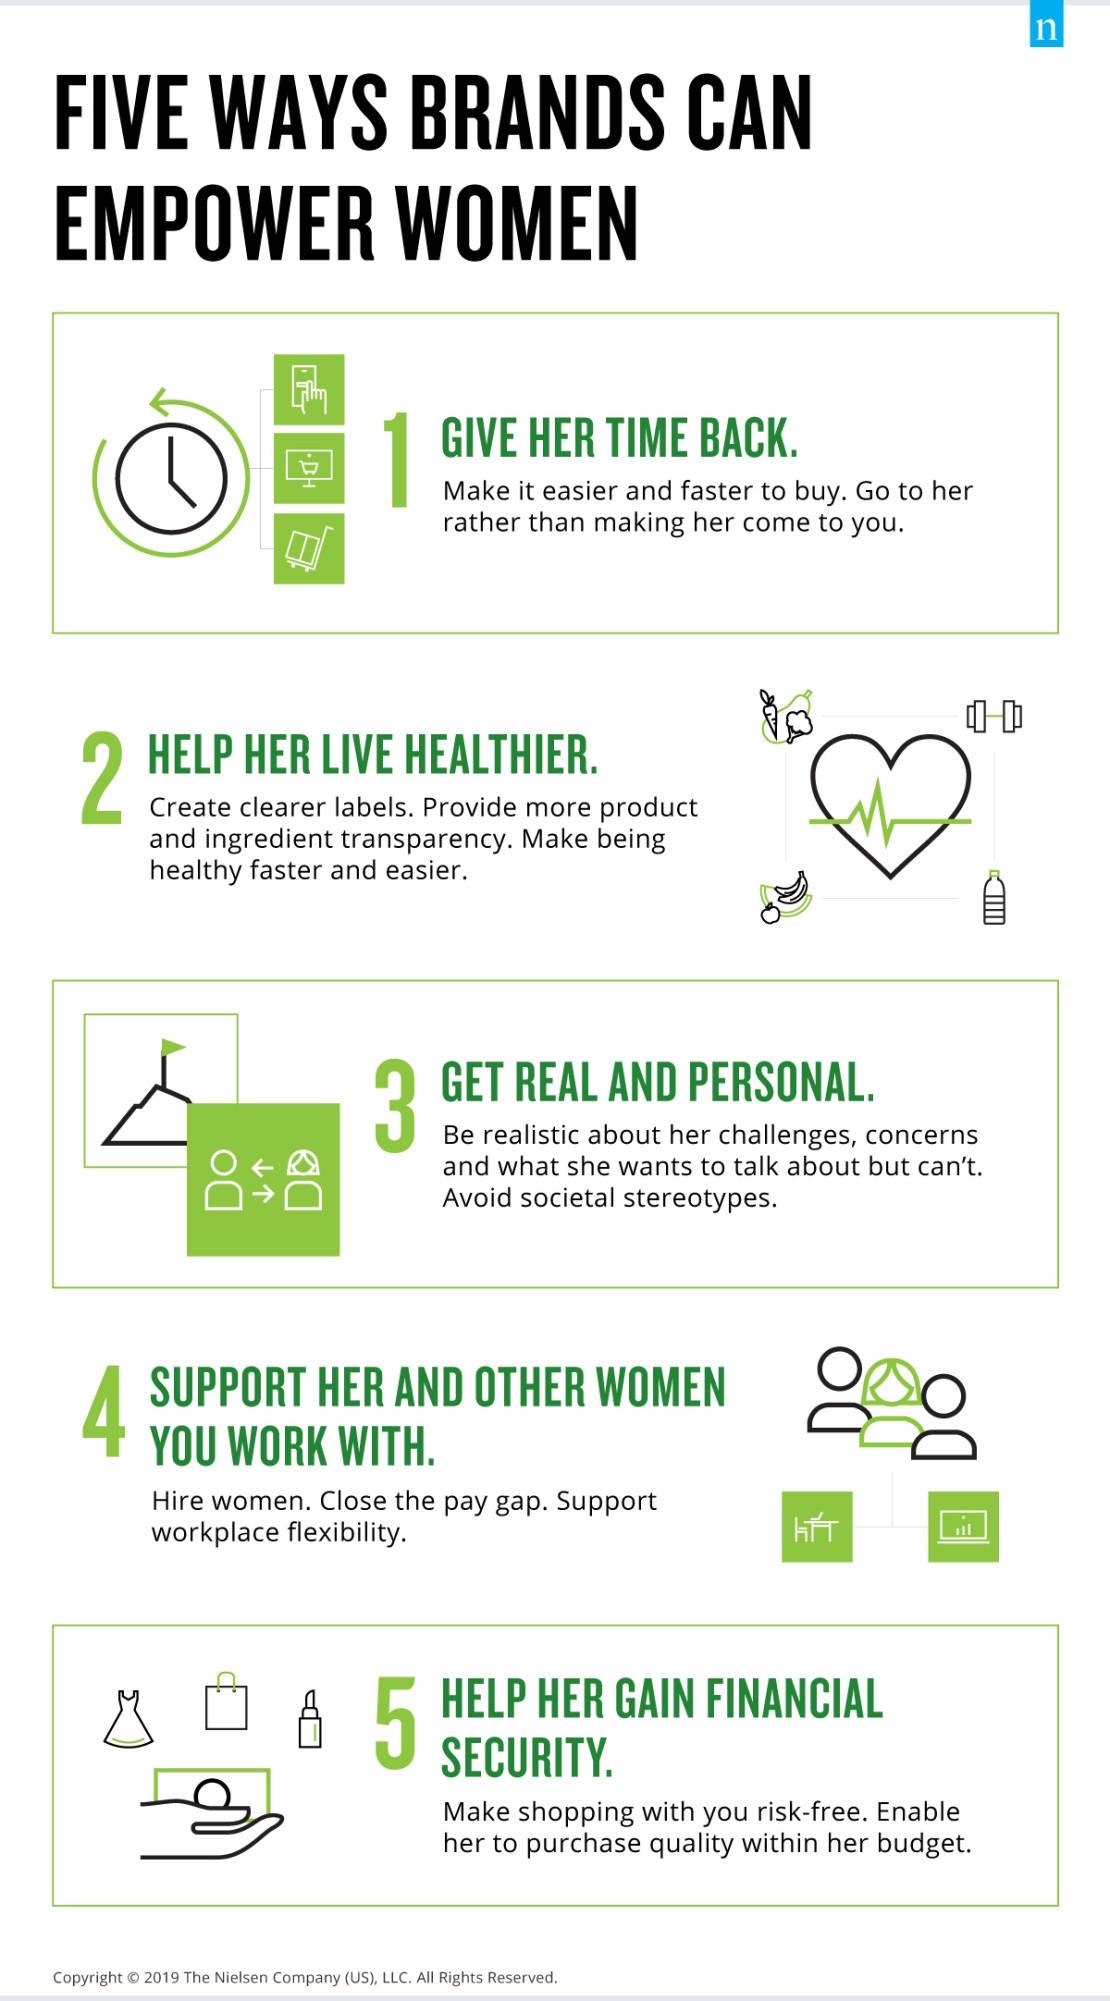 Five Ways Brands Can Empower Women